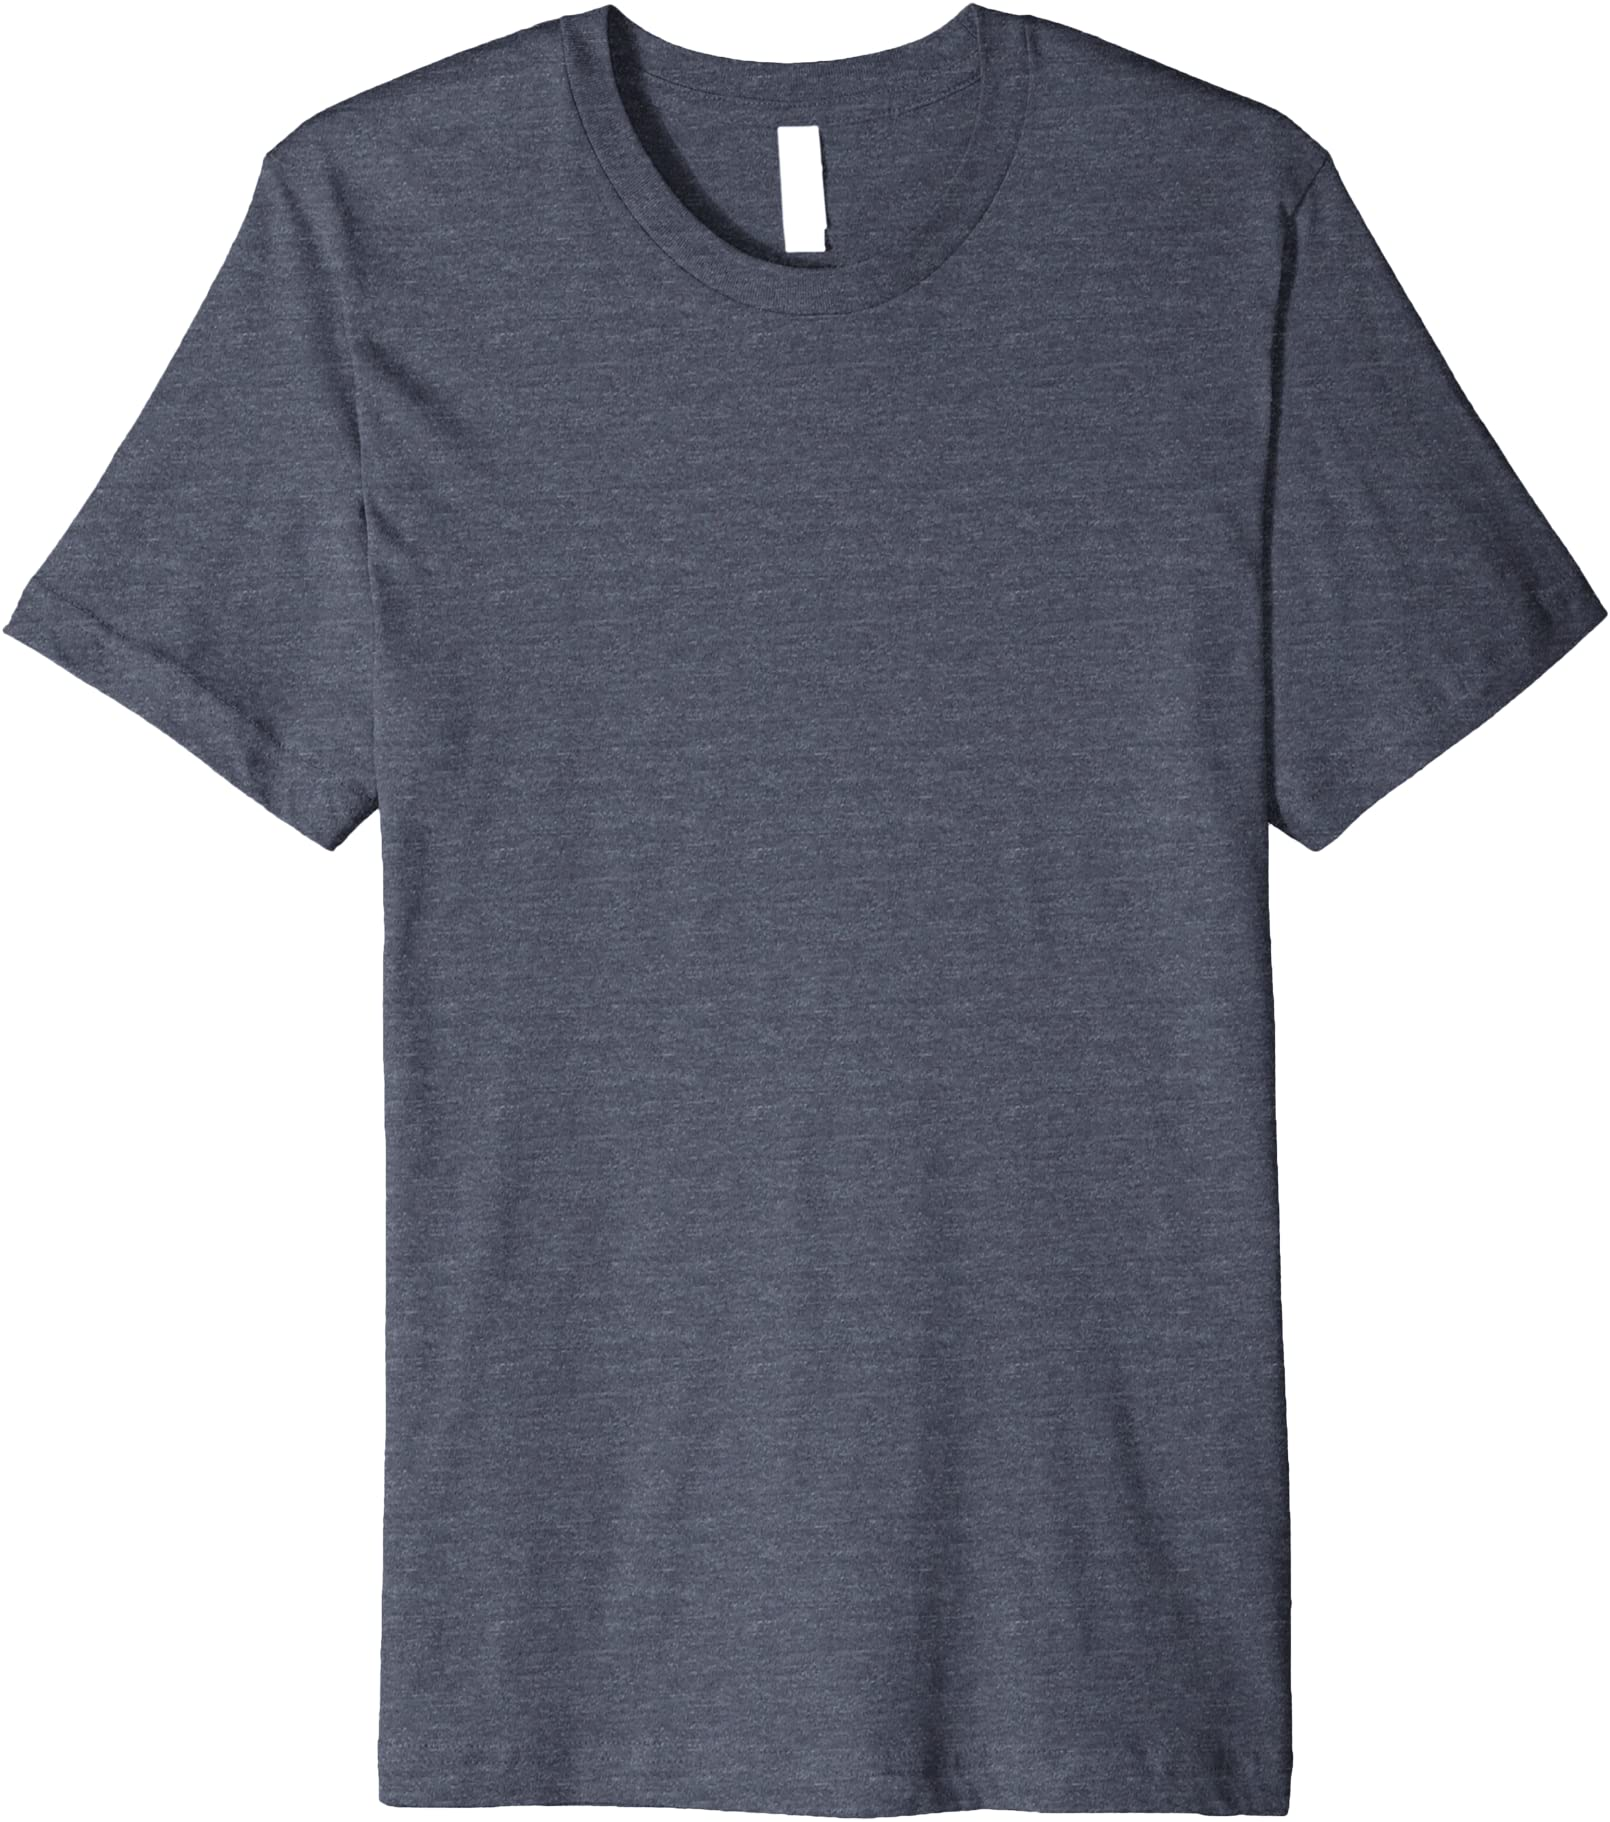 Check Engine light youth t-shirt Car and JDM kids shirts